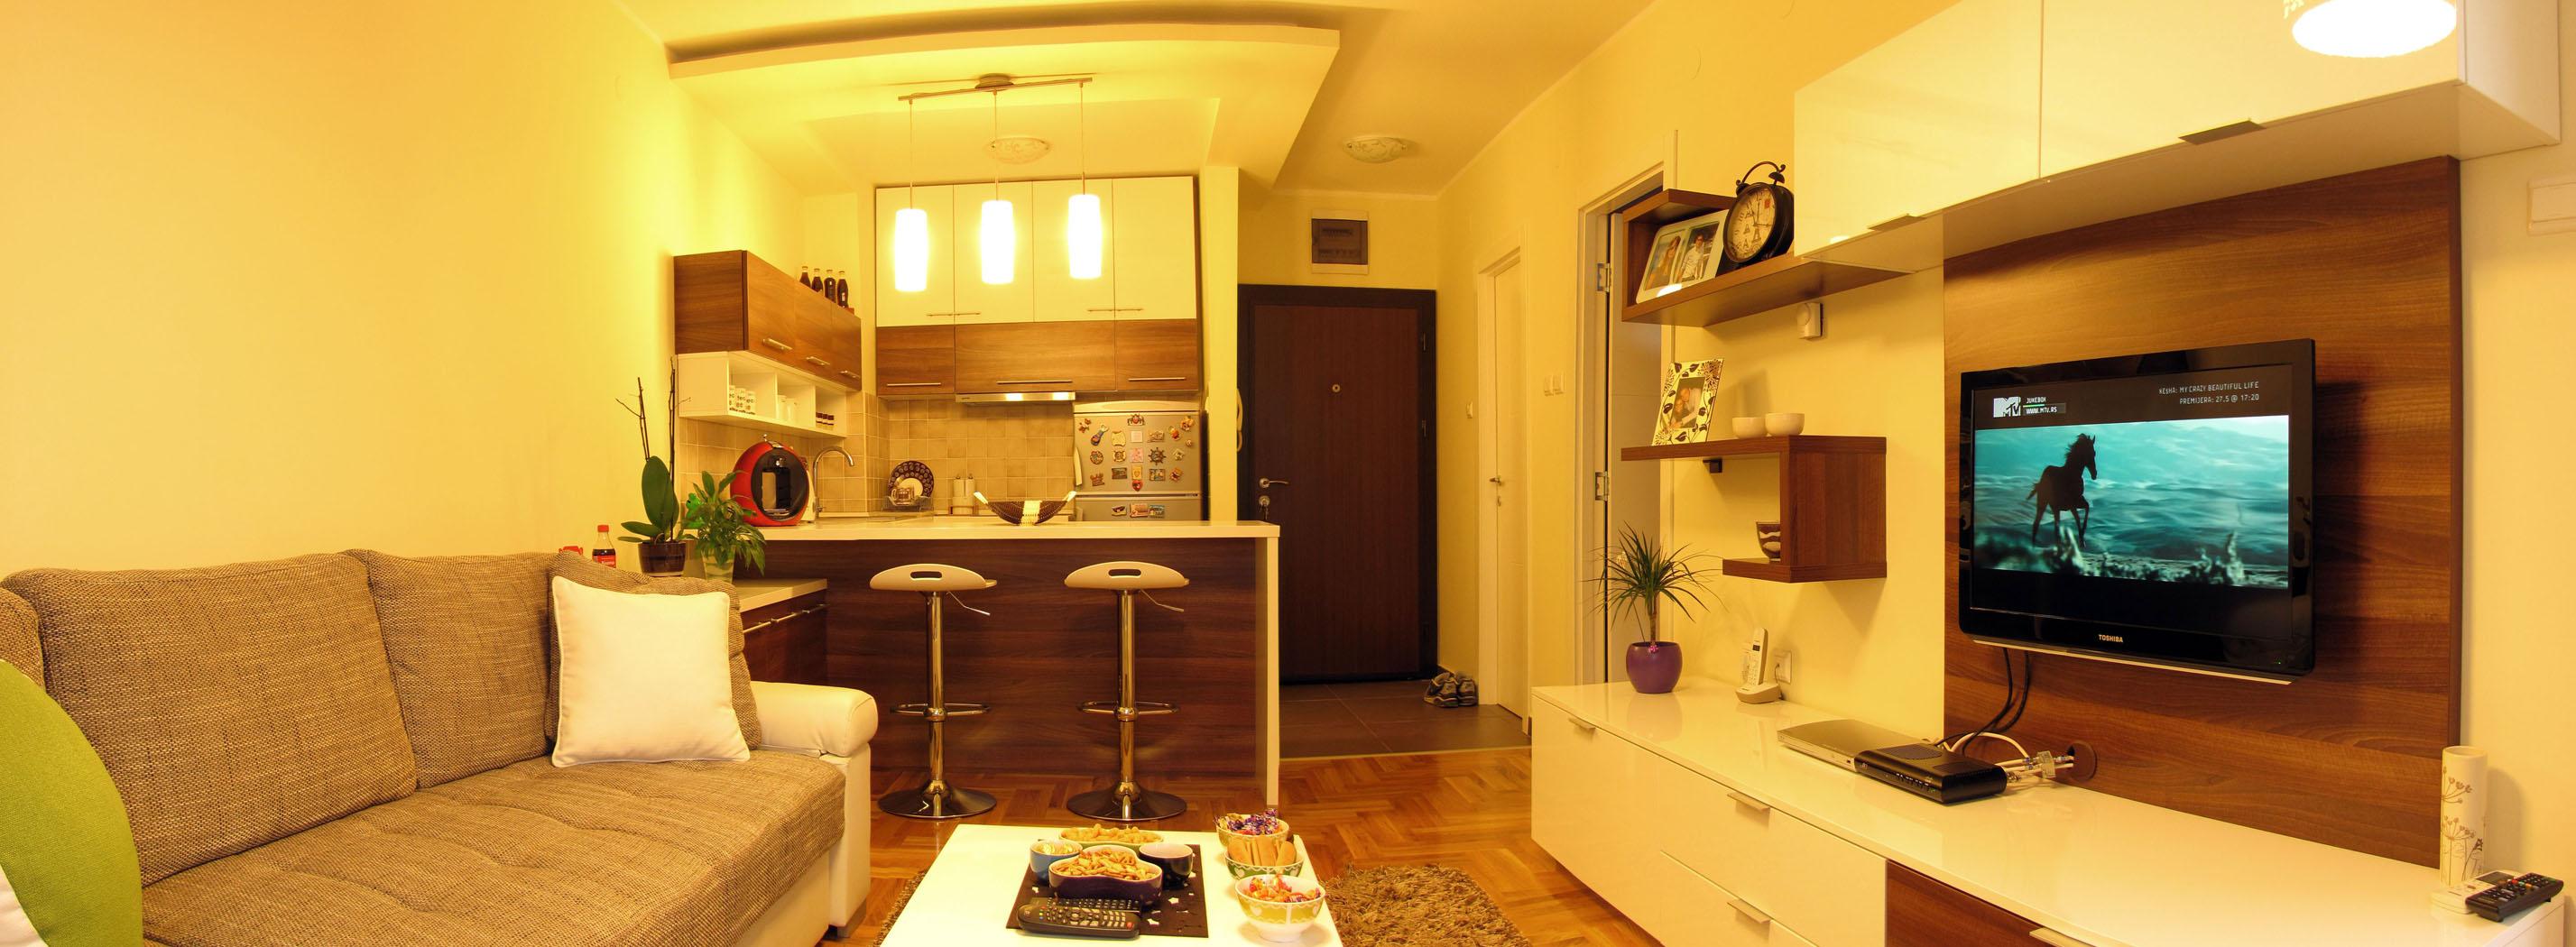 0025_LIVING ROOM